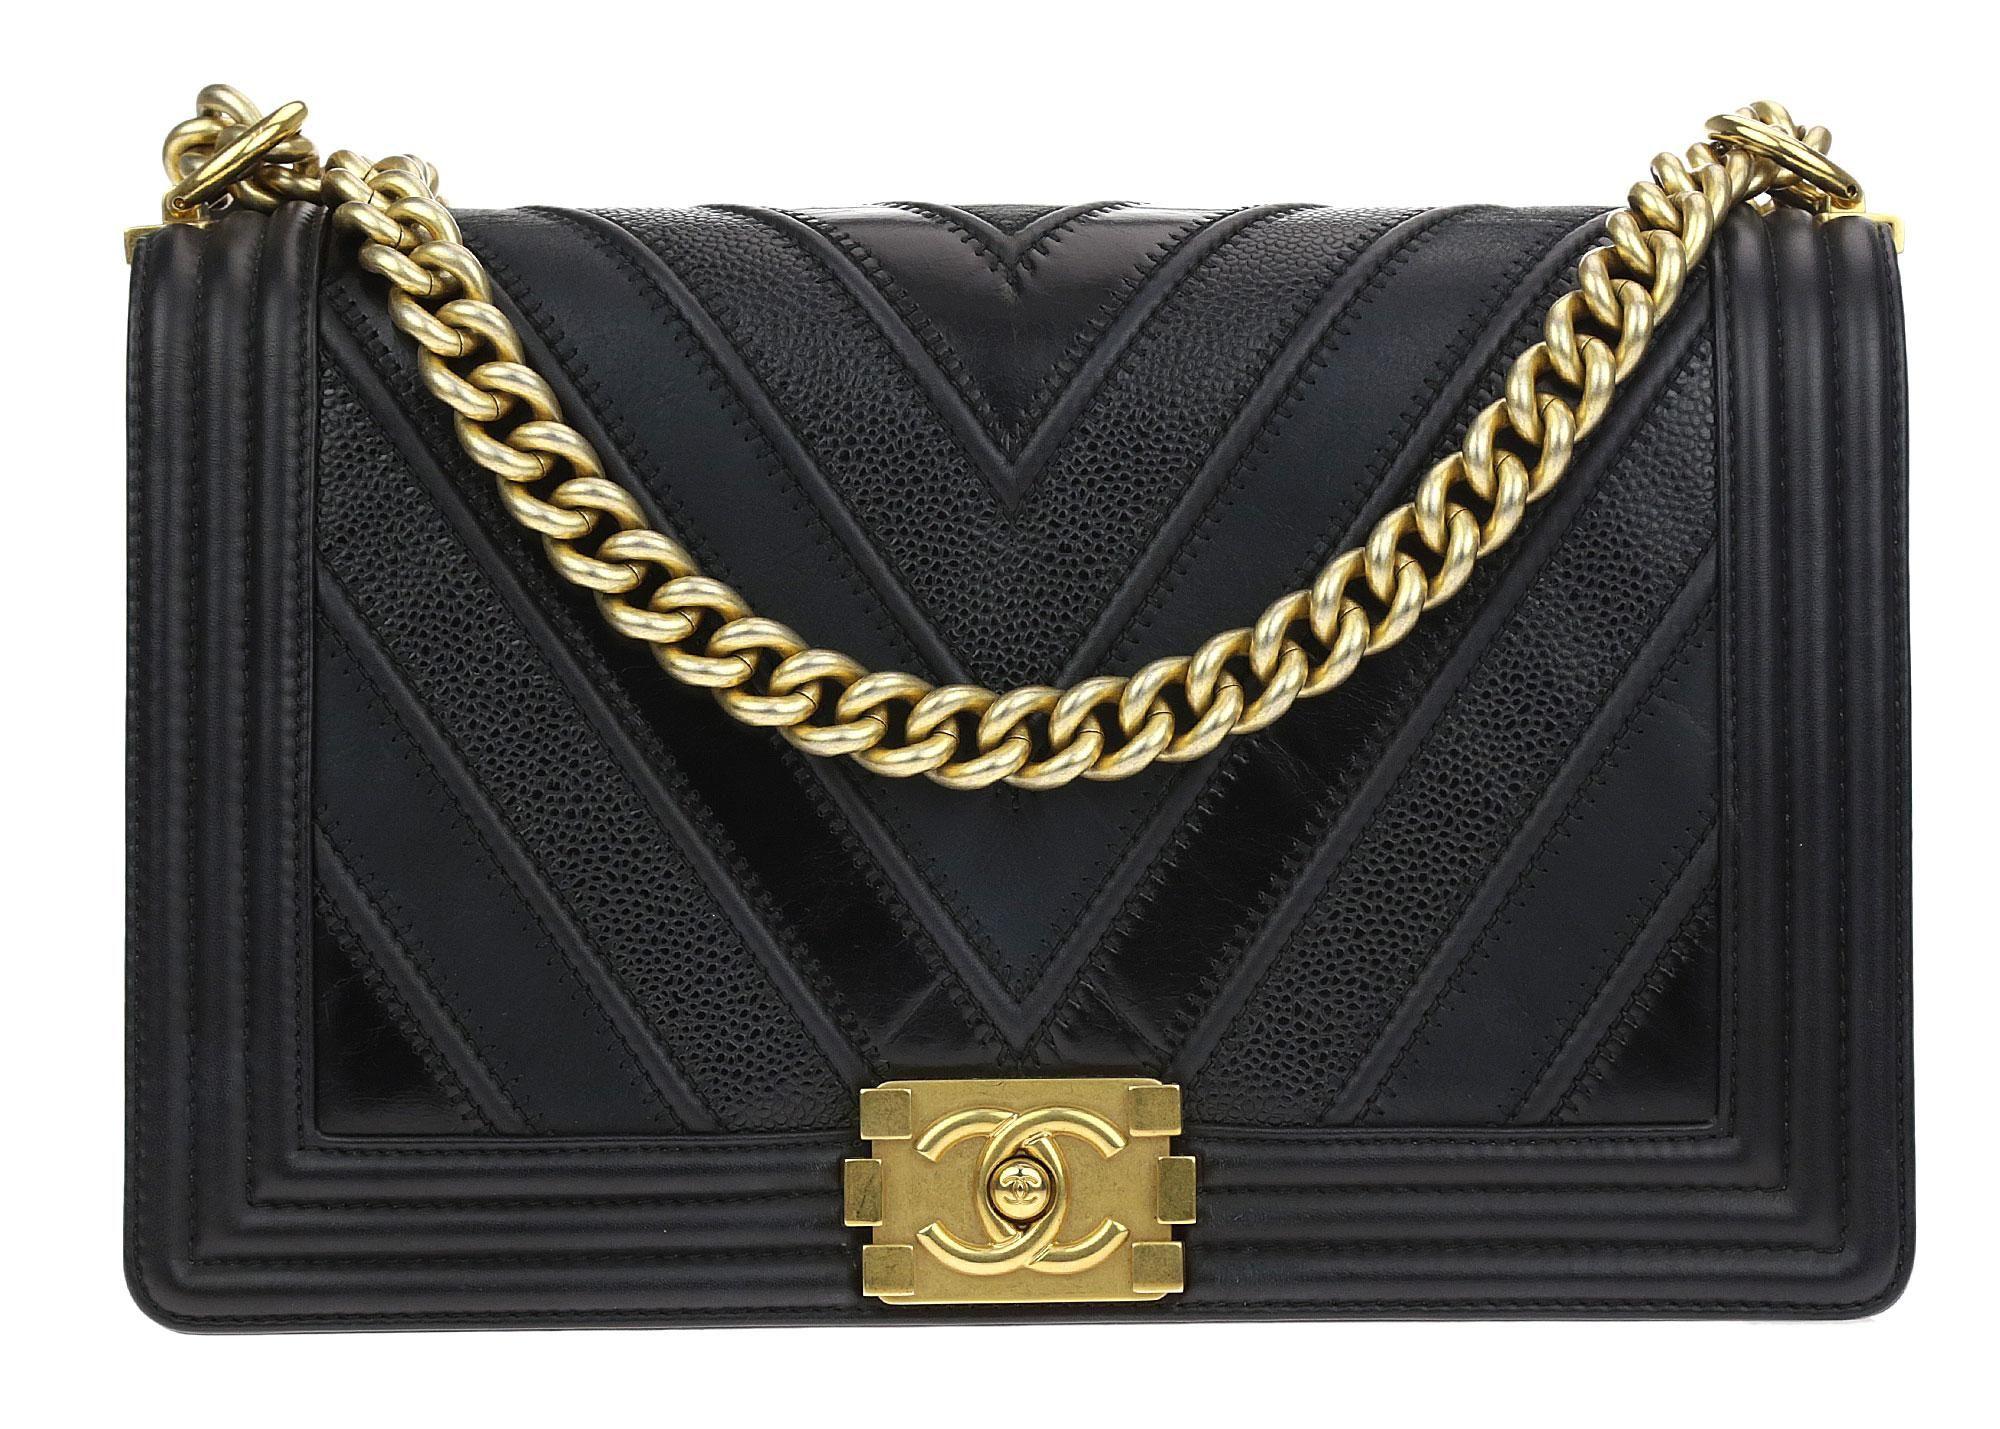 7da4f121b0b8 Chanel Caviar Suede Calfskin Chevron New Medium Boy Shoulder Bag. Get one  of the hottest styles of the season! The Chanel Caviar Suede Calfskin  Chevron New ...